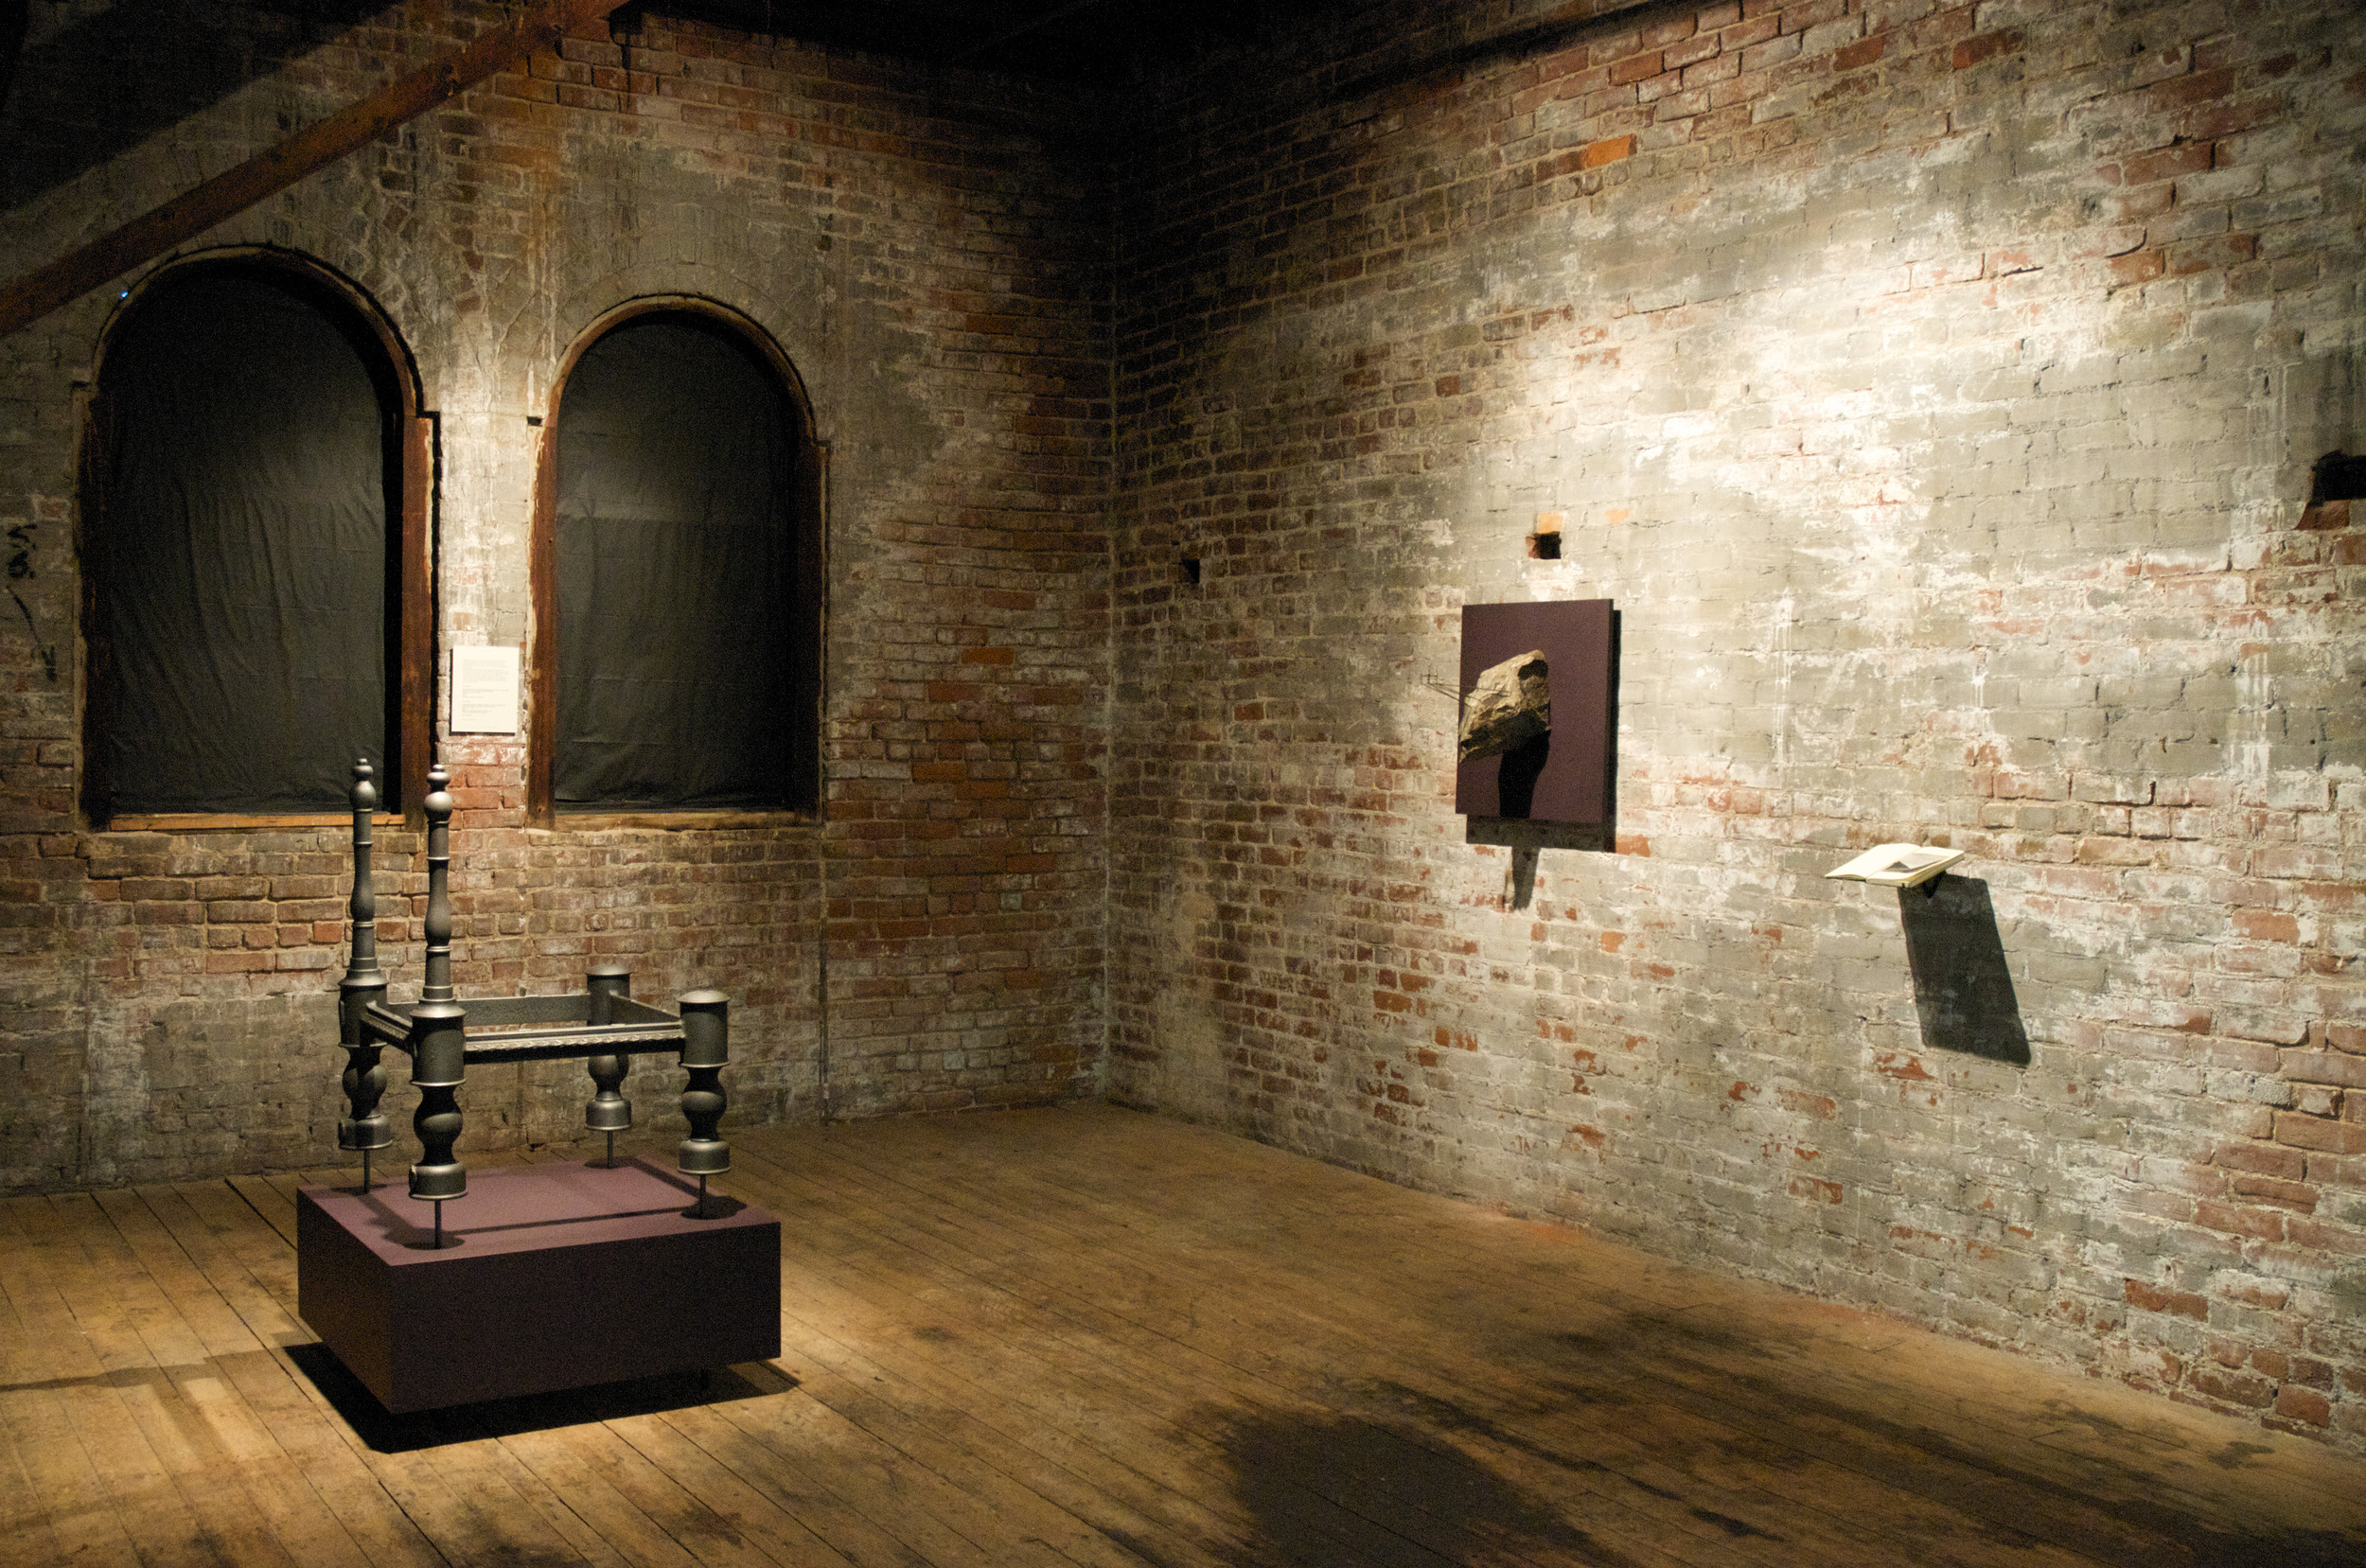 Monument to Magellan / Magellan's Chair